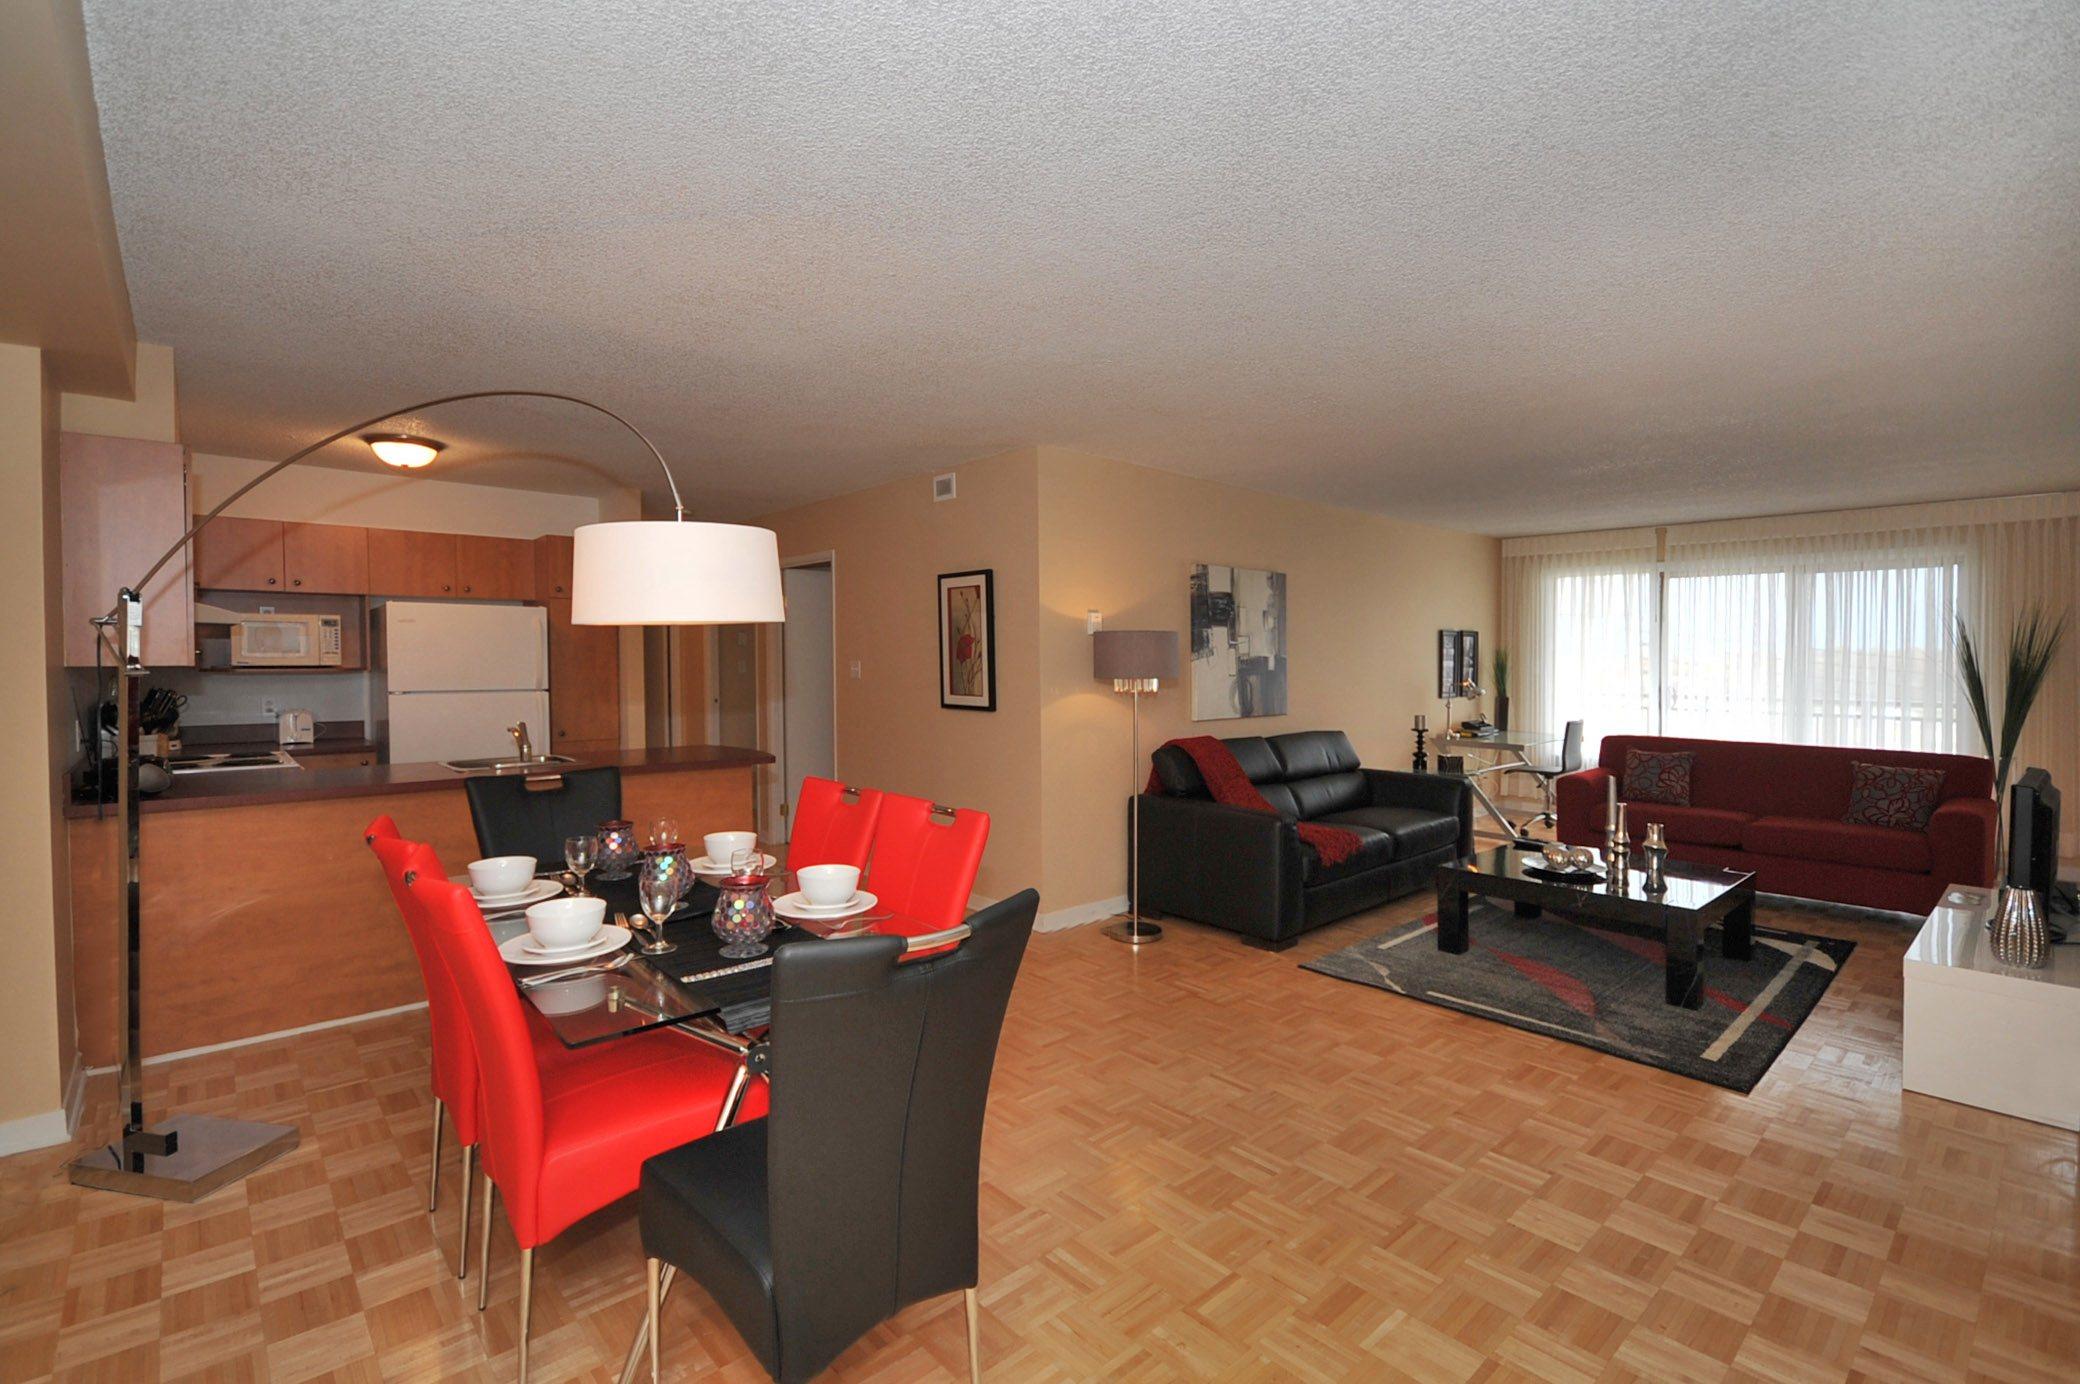 Premiere Executive Suites Montreal